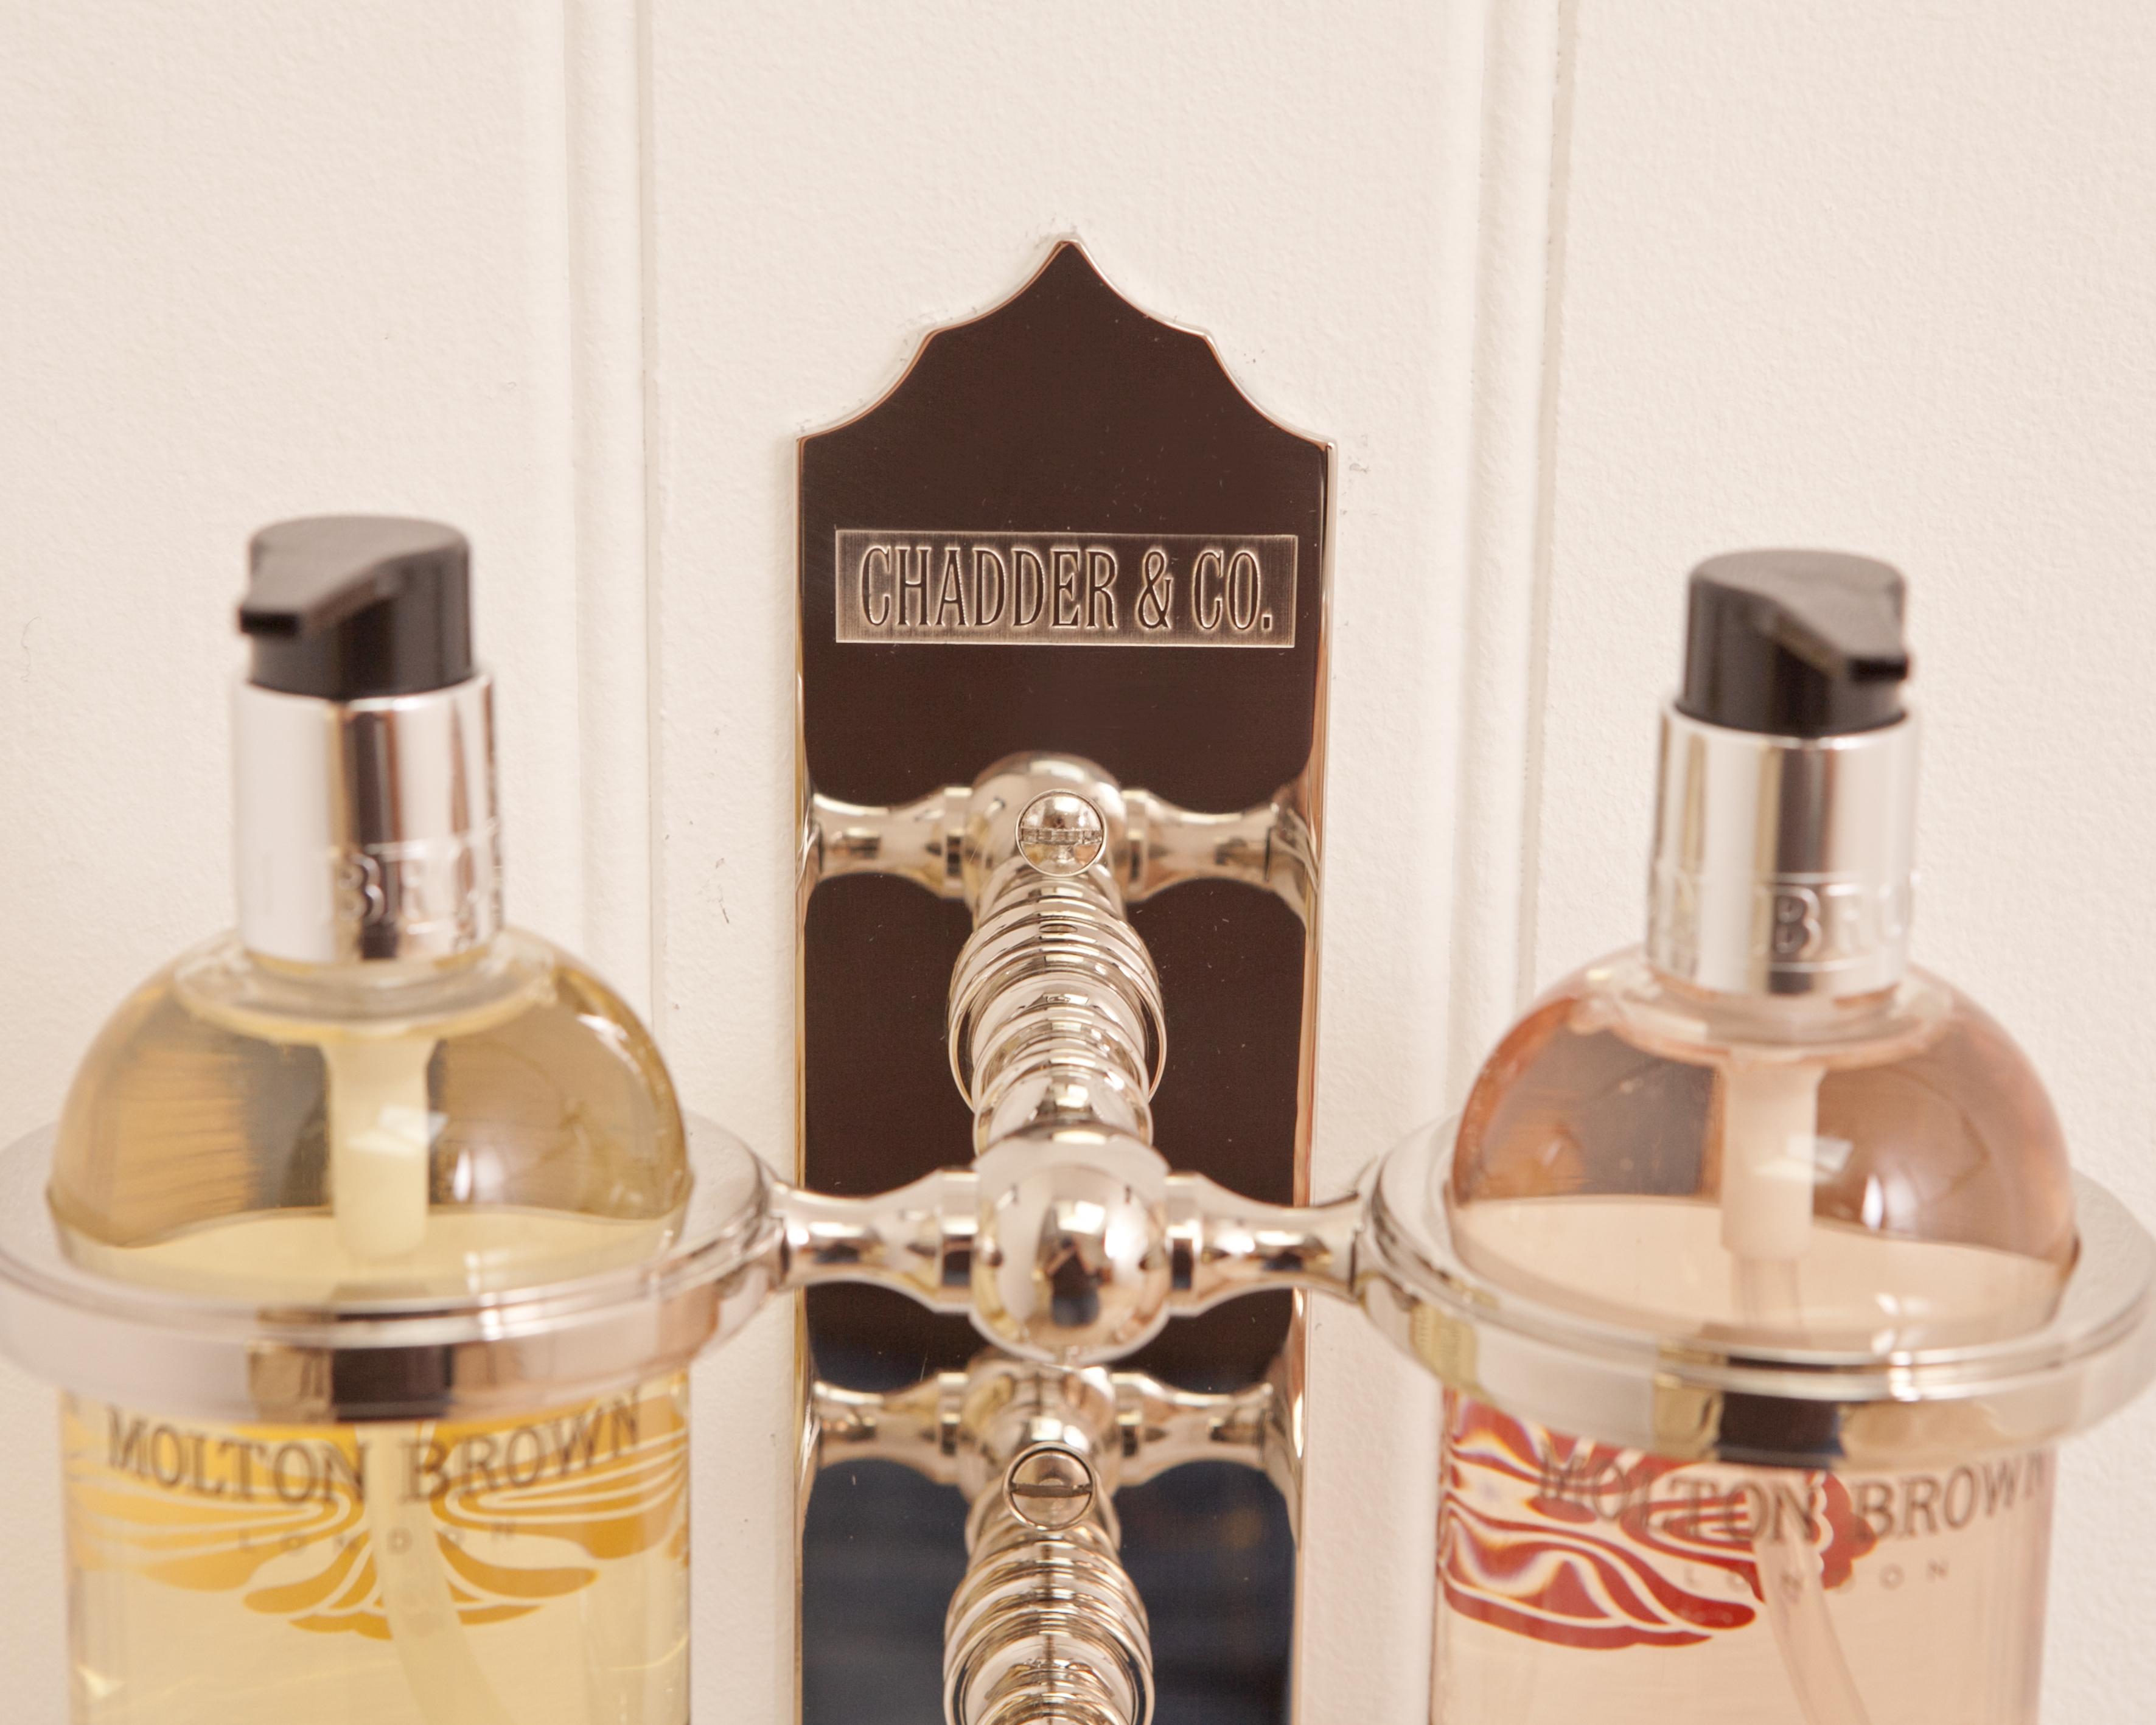 soap holder bathroom accessory molton brown penhaligions chadder and co